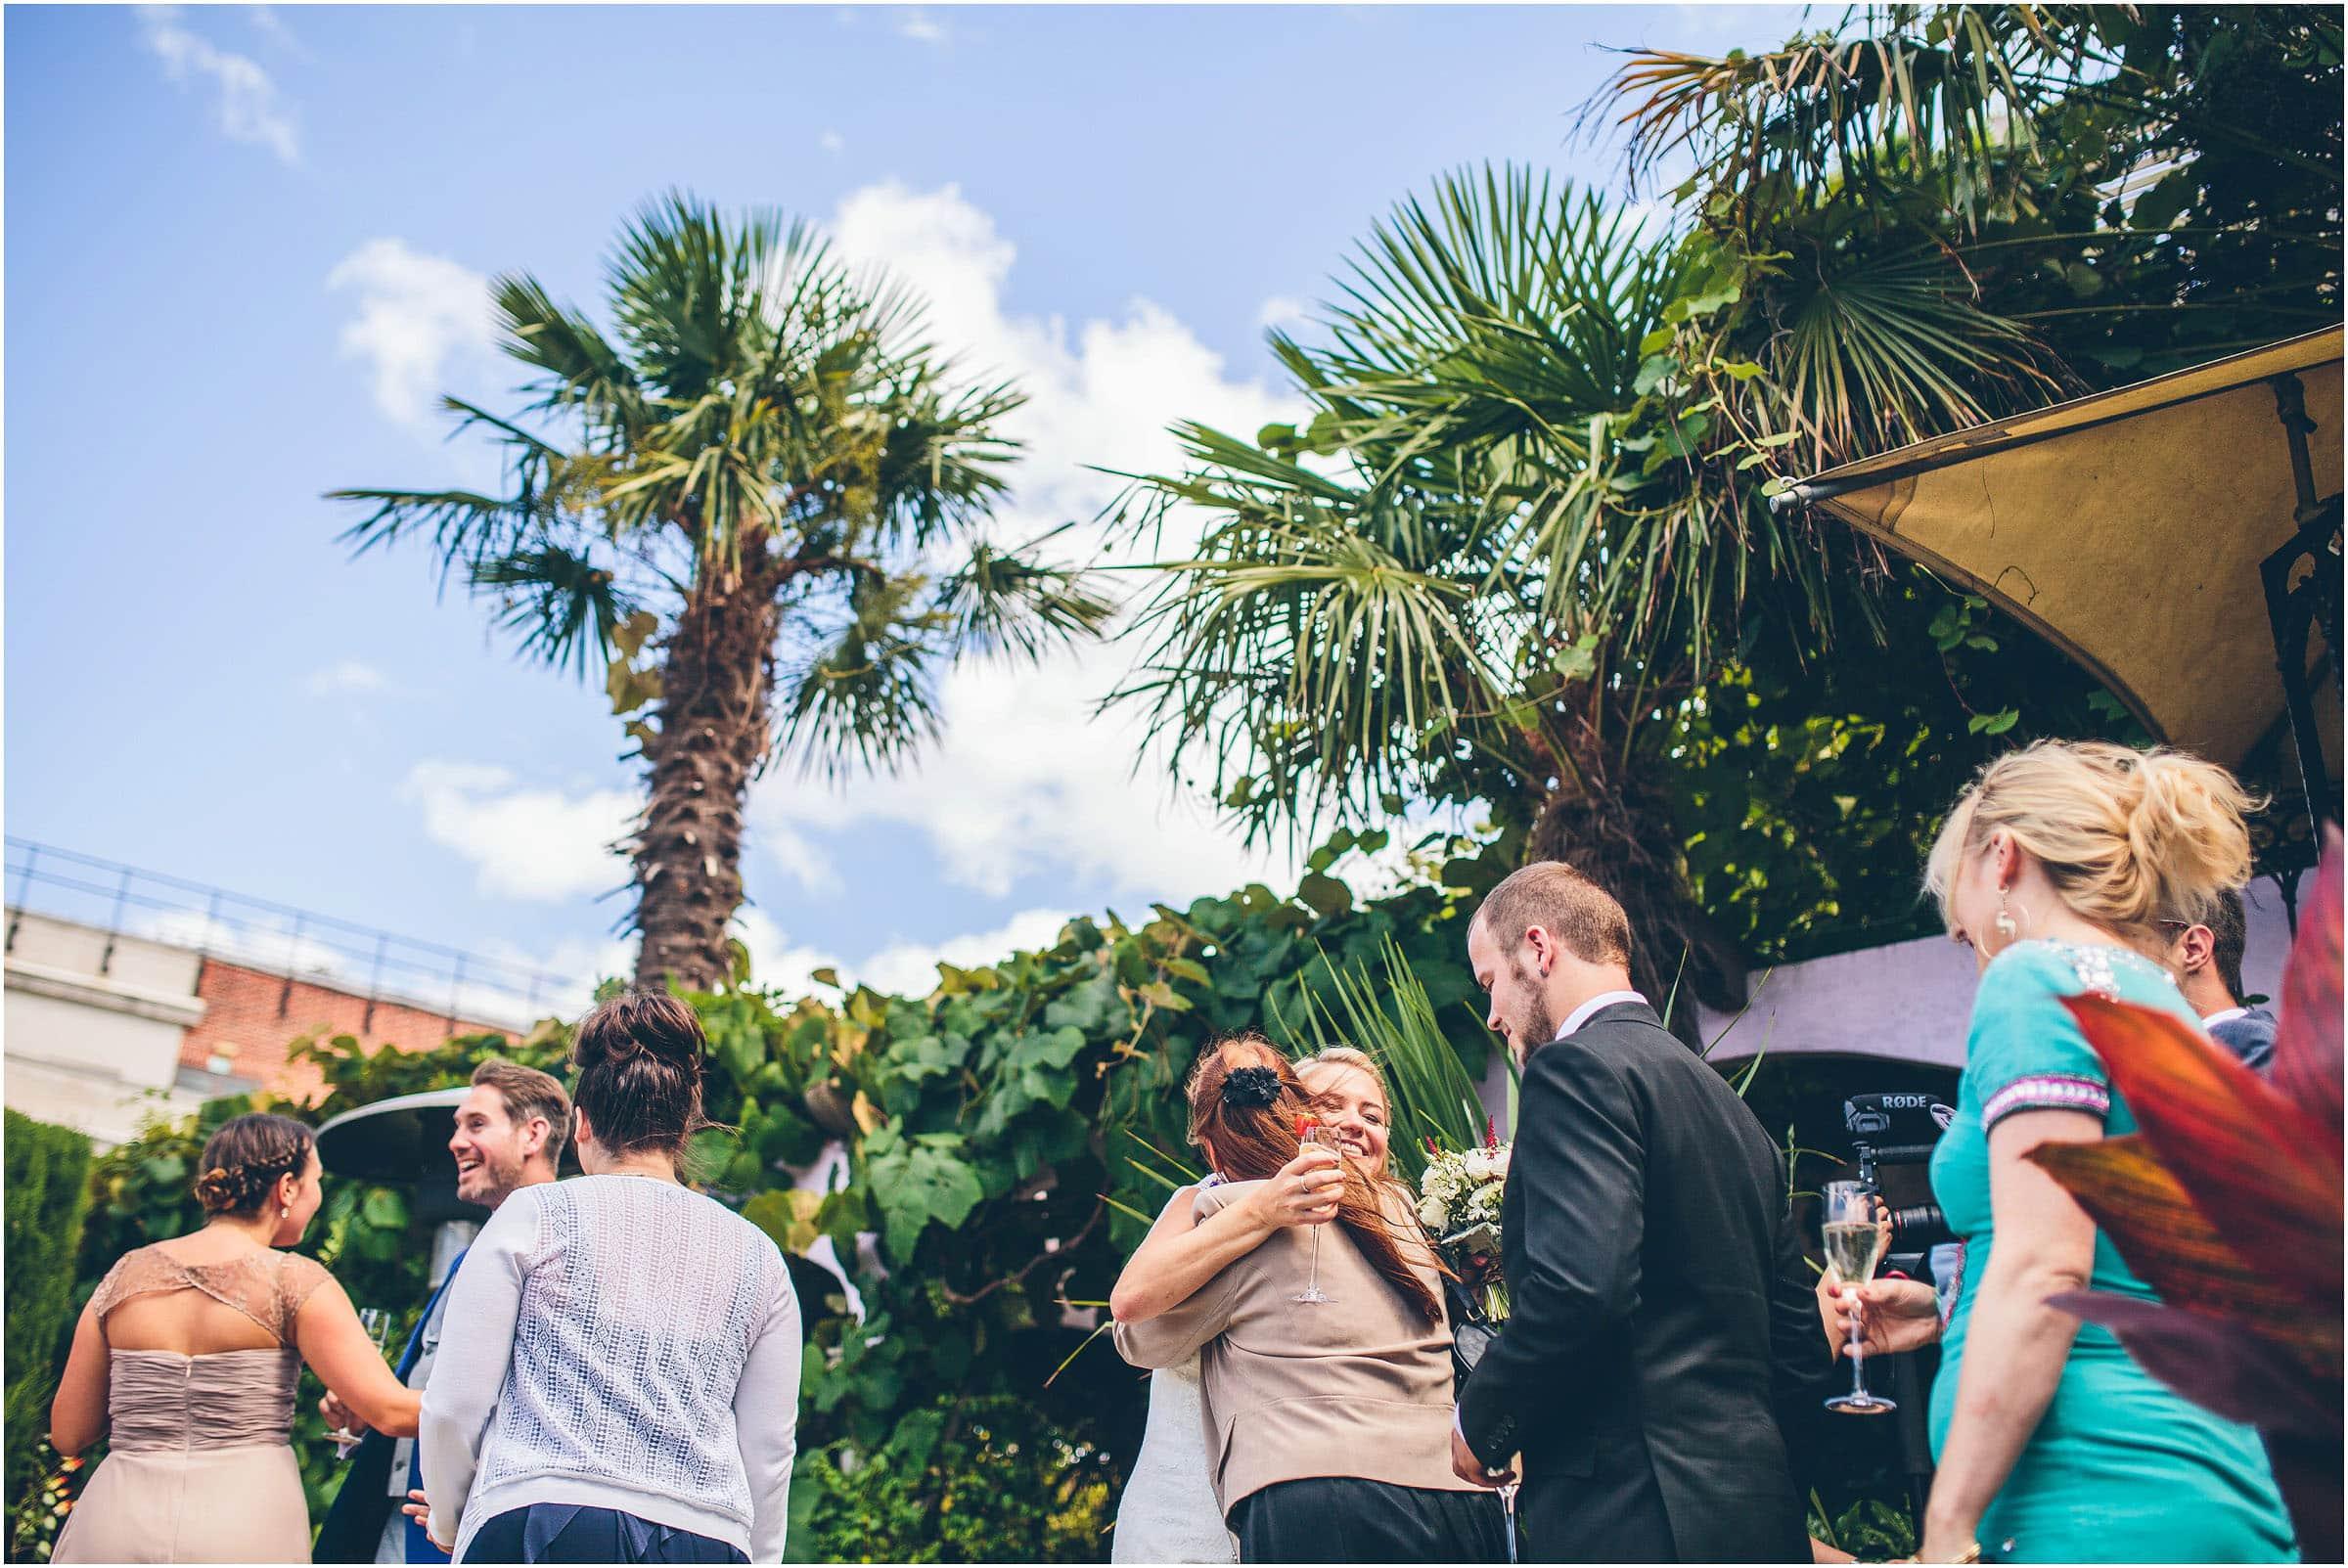 Kensington_Roof_Gardens_Wedding_Photography_0046